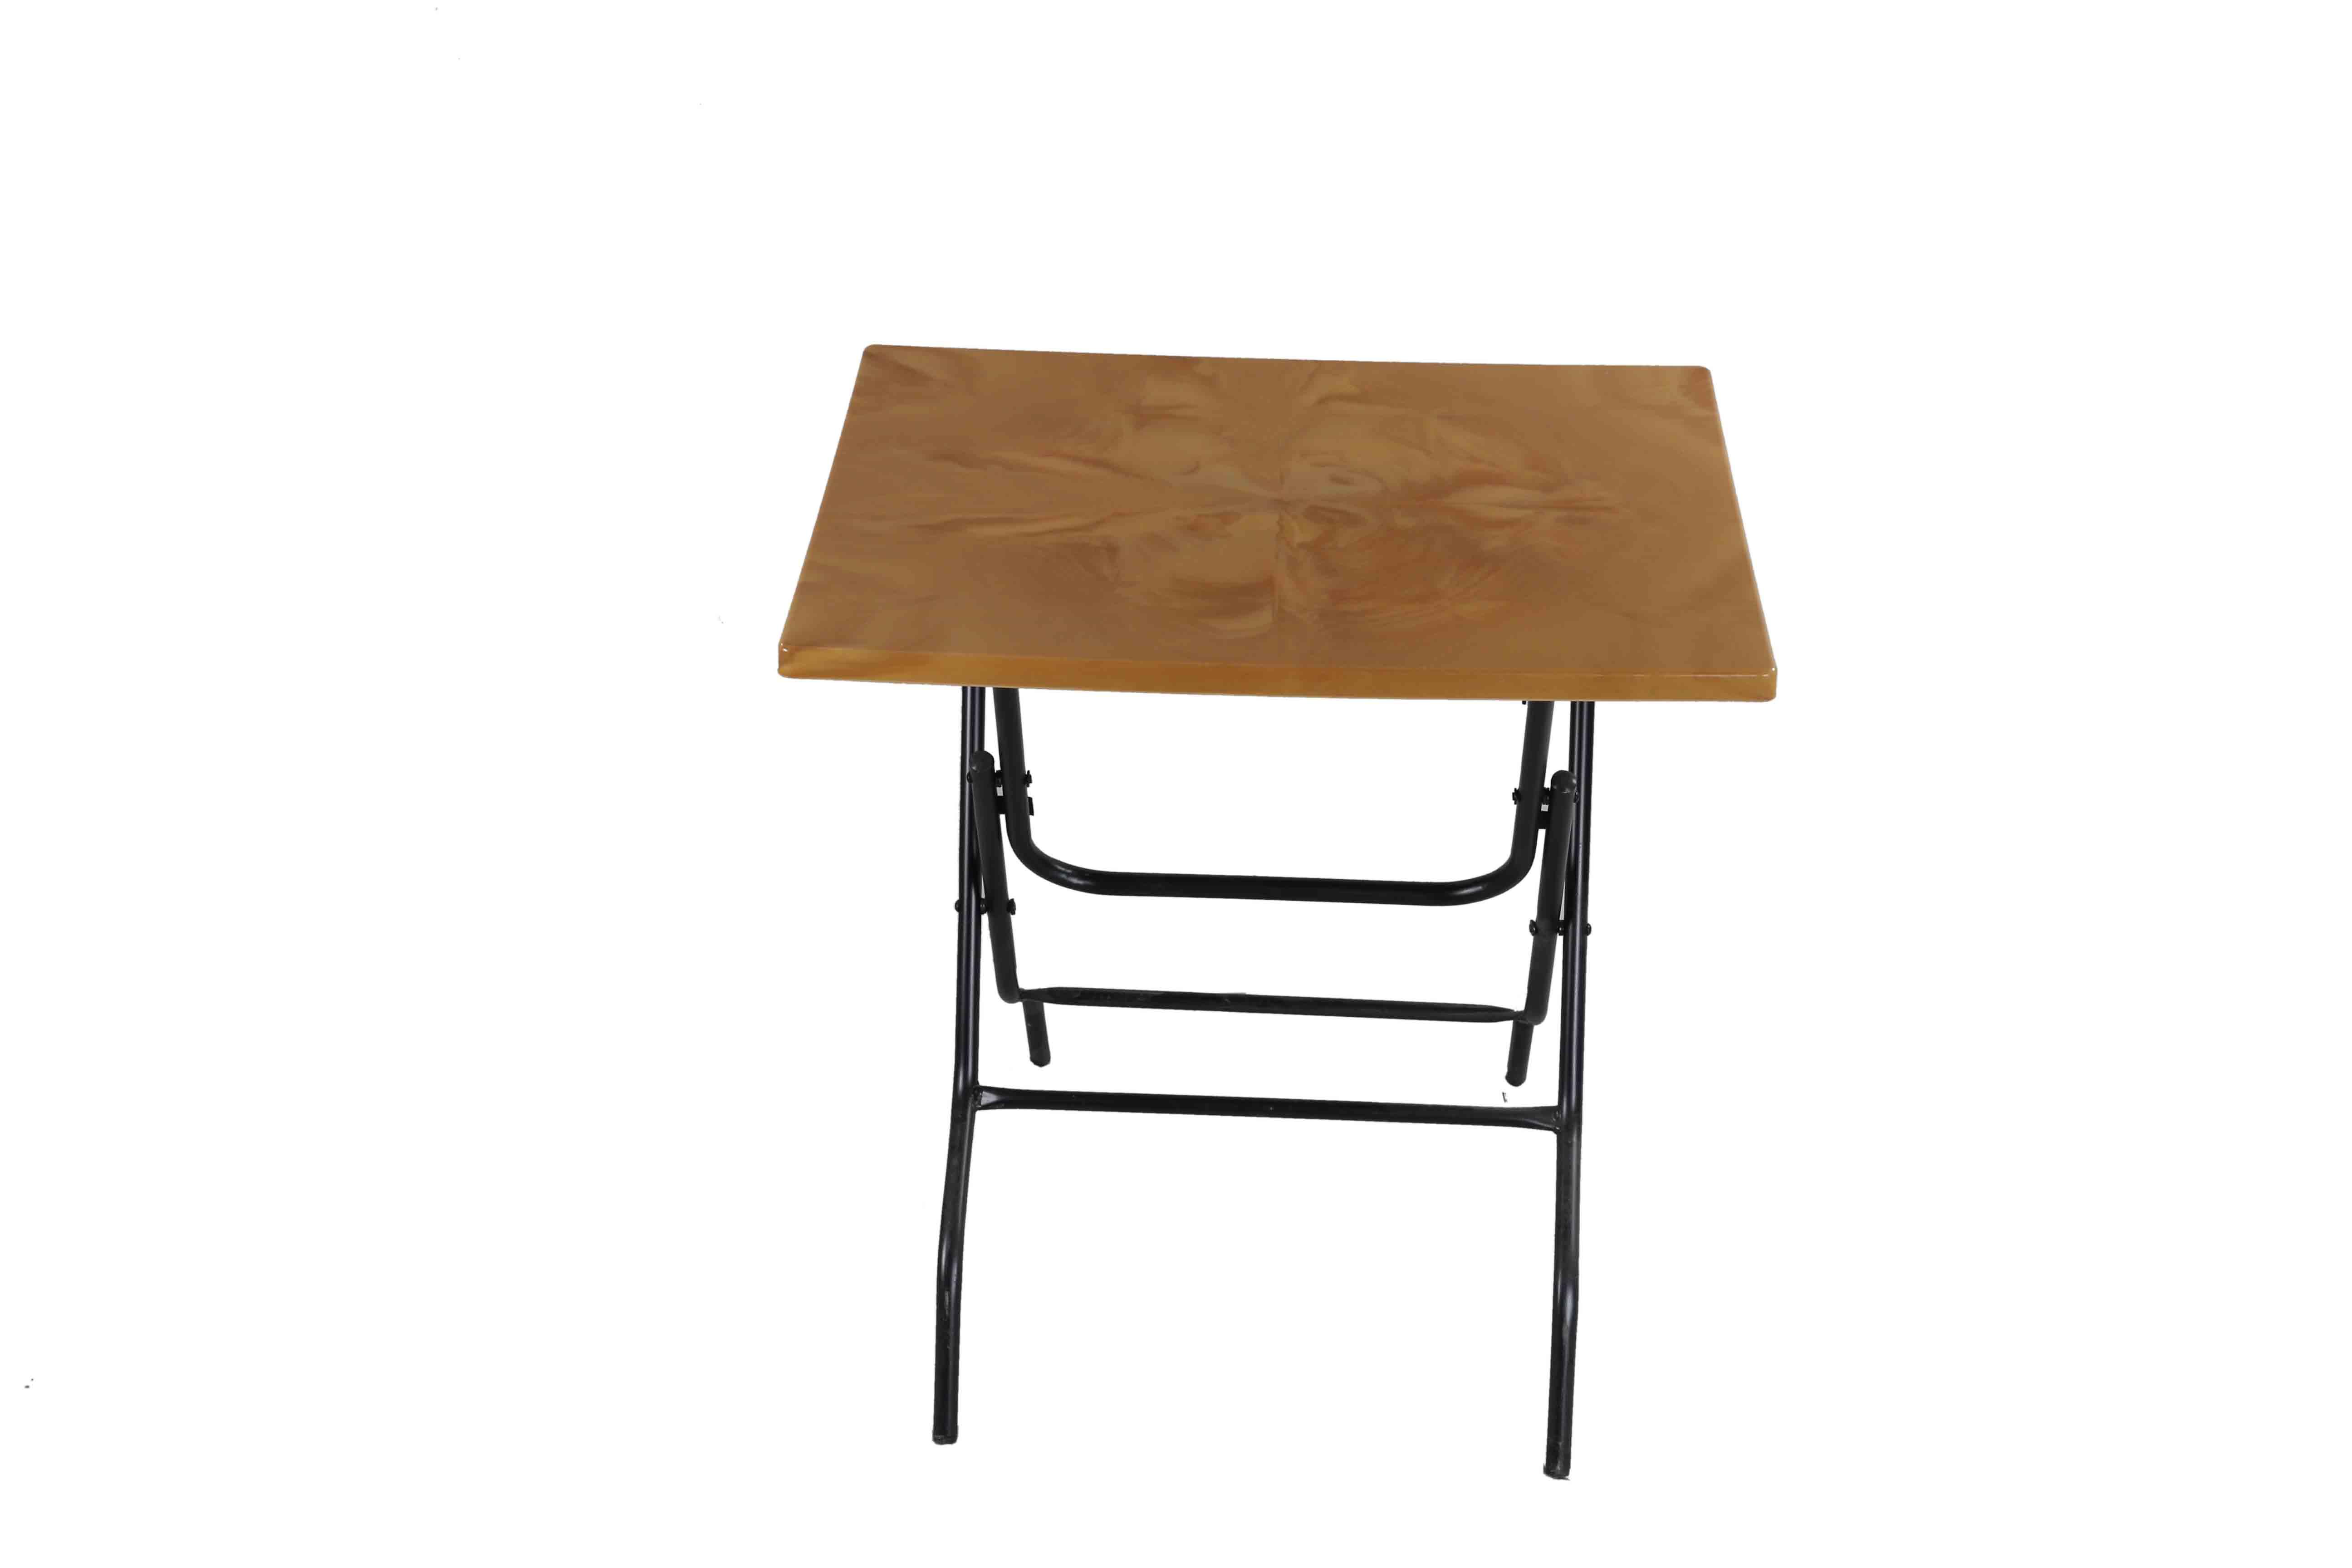 Restaurant Table Two Seat St/Leg – Sandal Wood